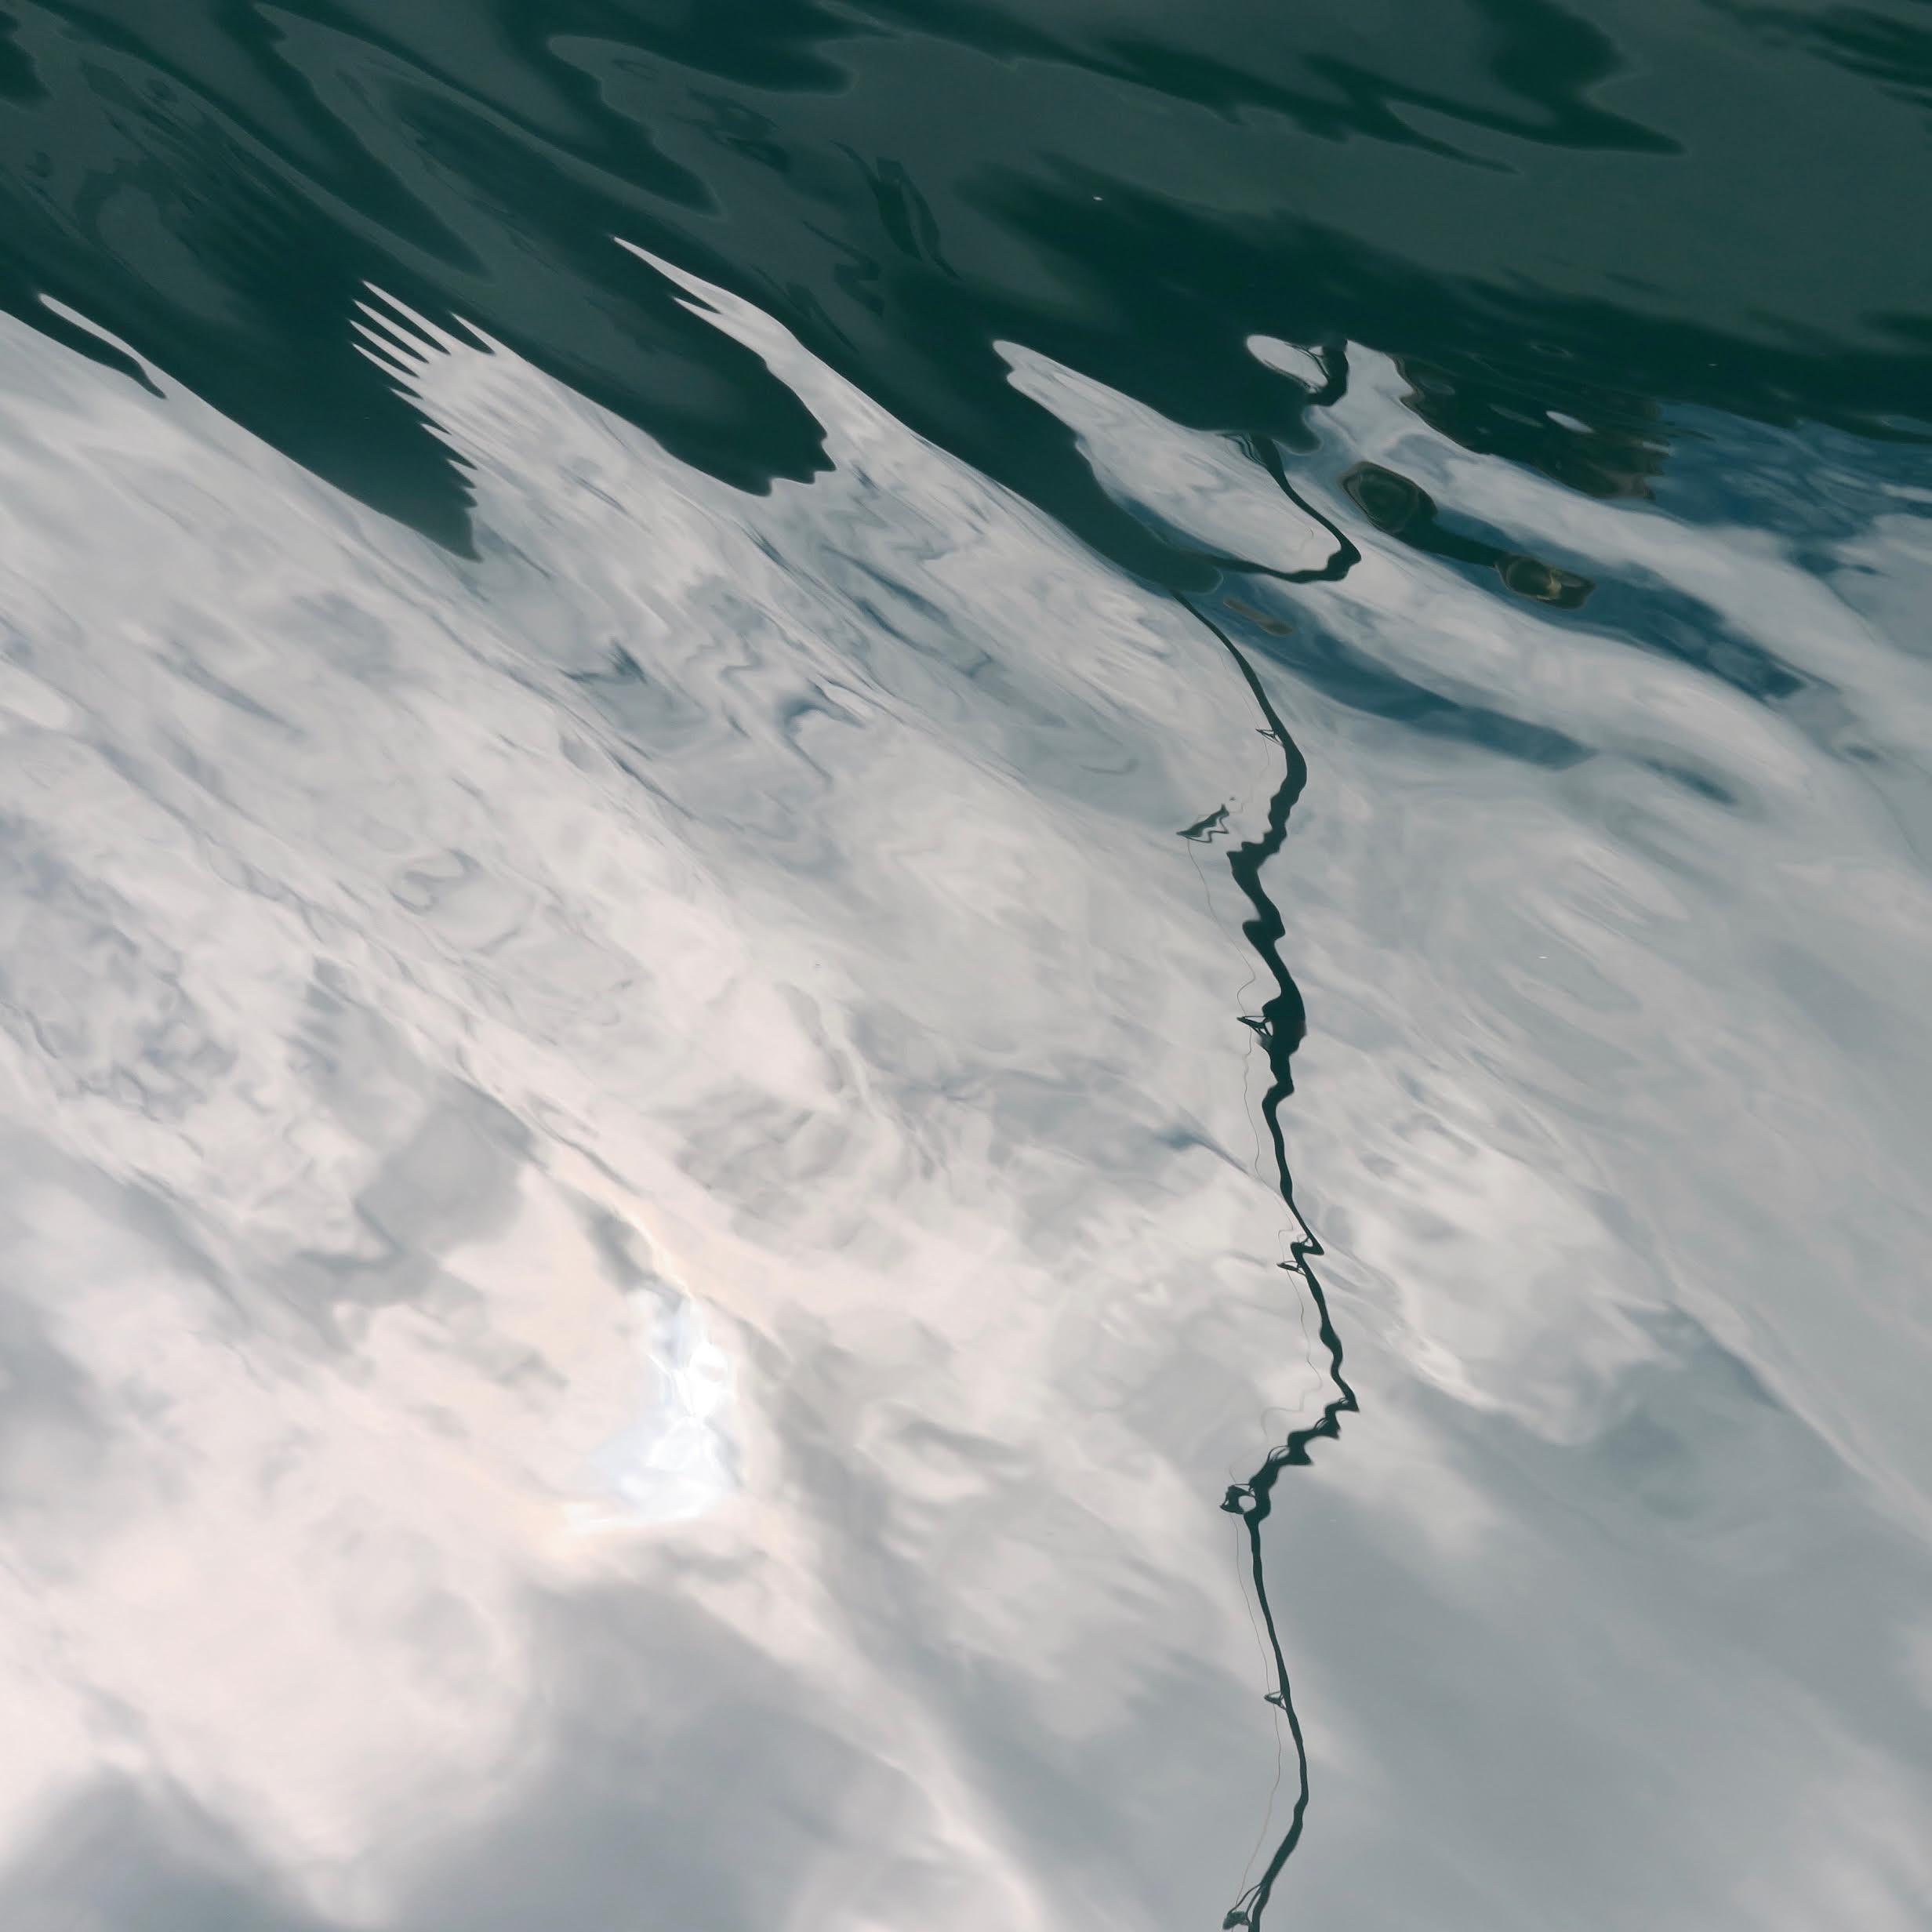 Alaska Pole 68, 2016